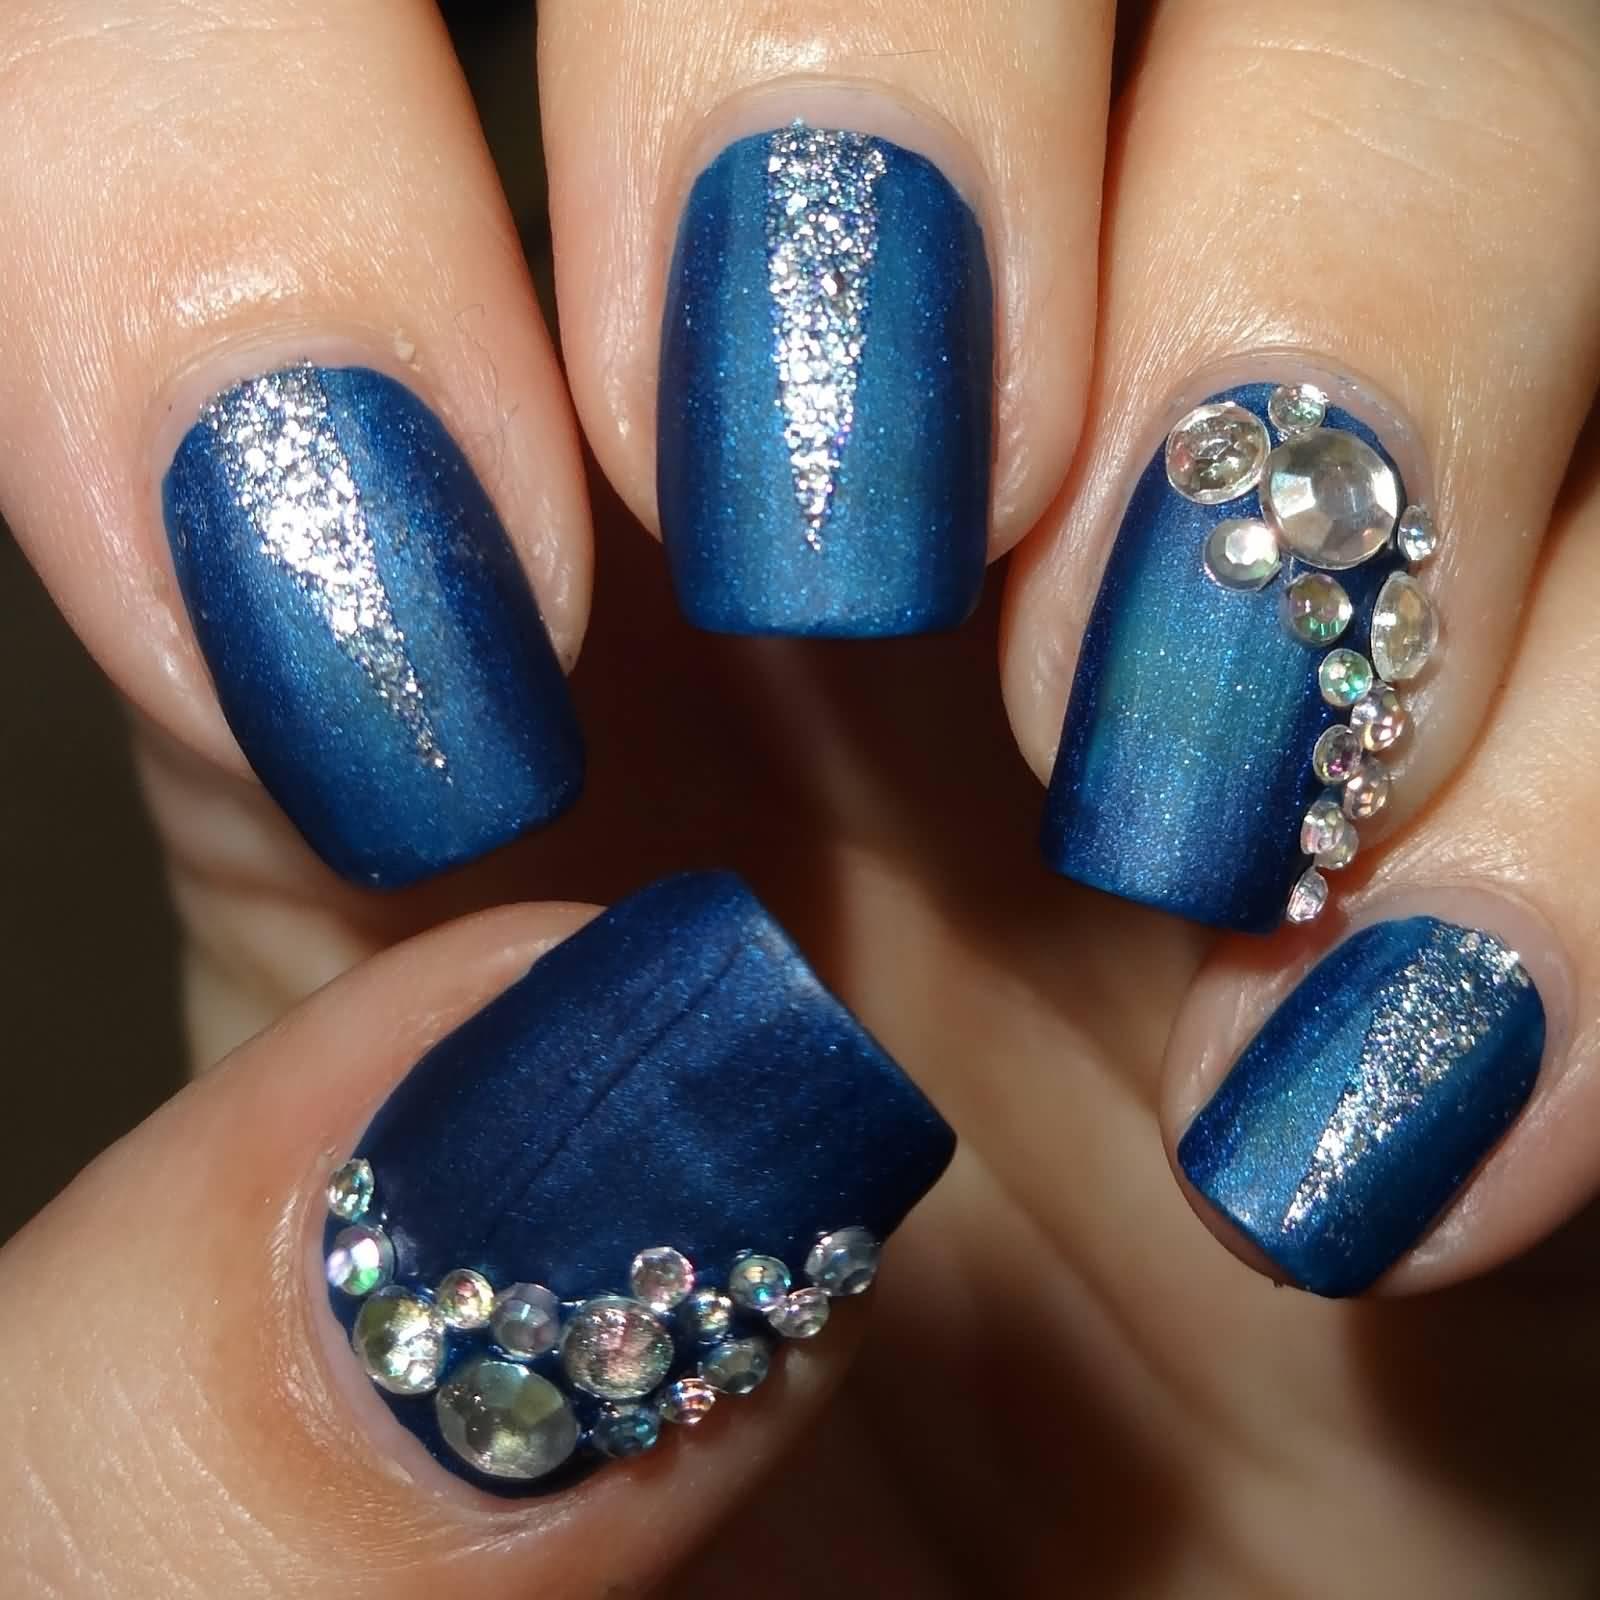 Beautiful nail art las vegas images everyday style ideas 3d nail most beautiful d nail art design ideas for trendy girls 3d nail art las vegas prinsesfo Choice Image